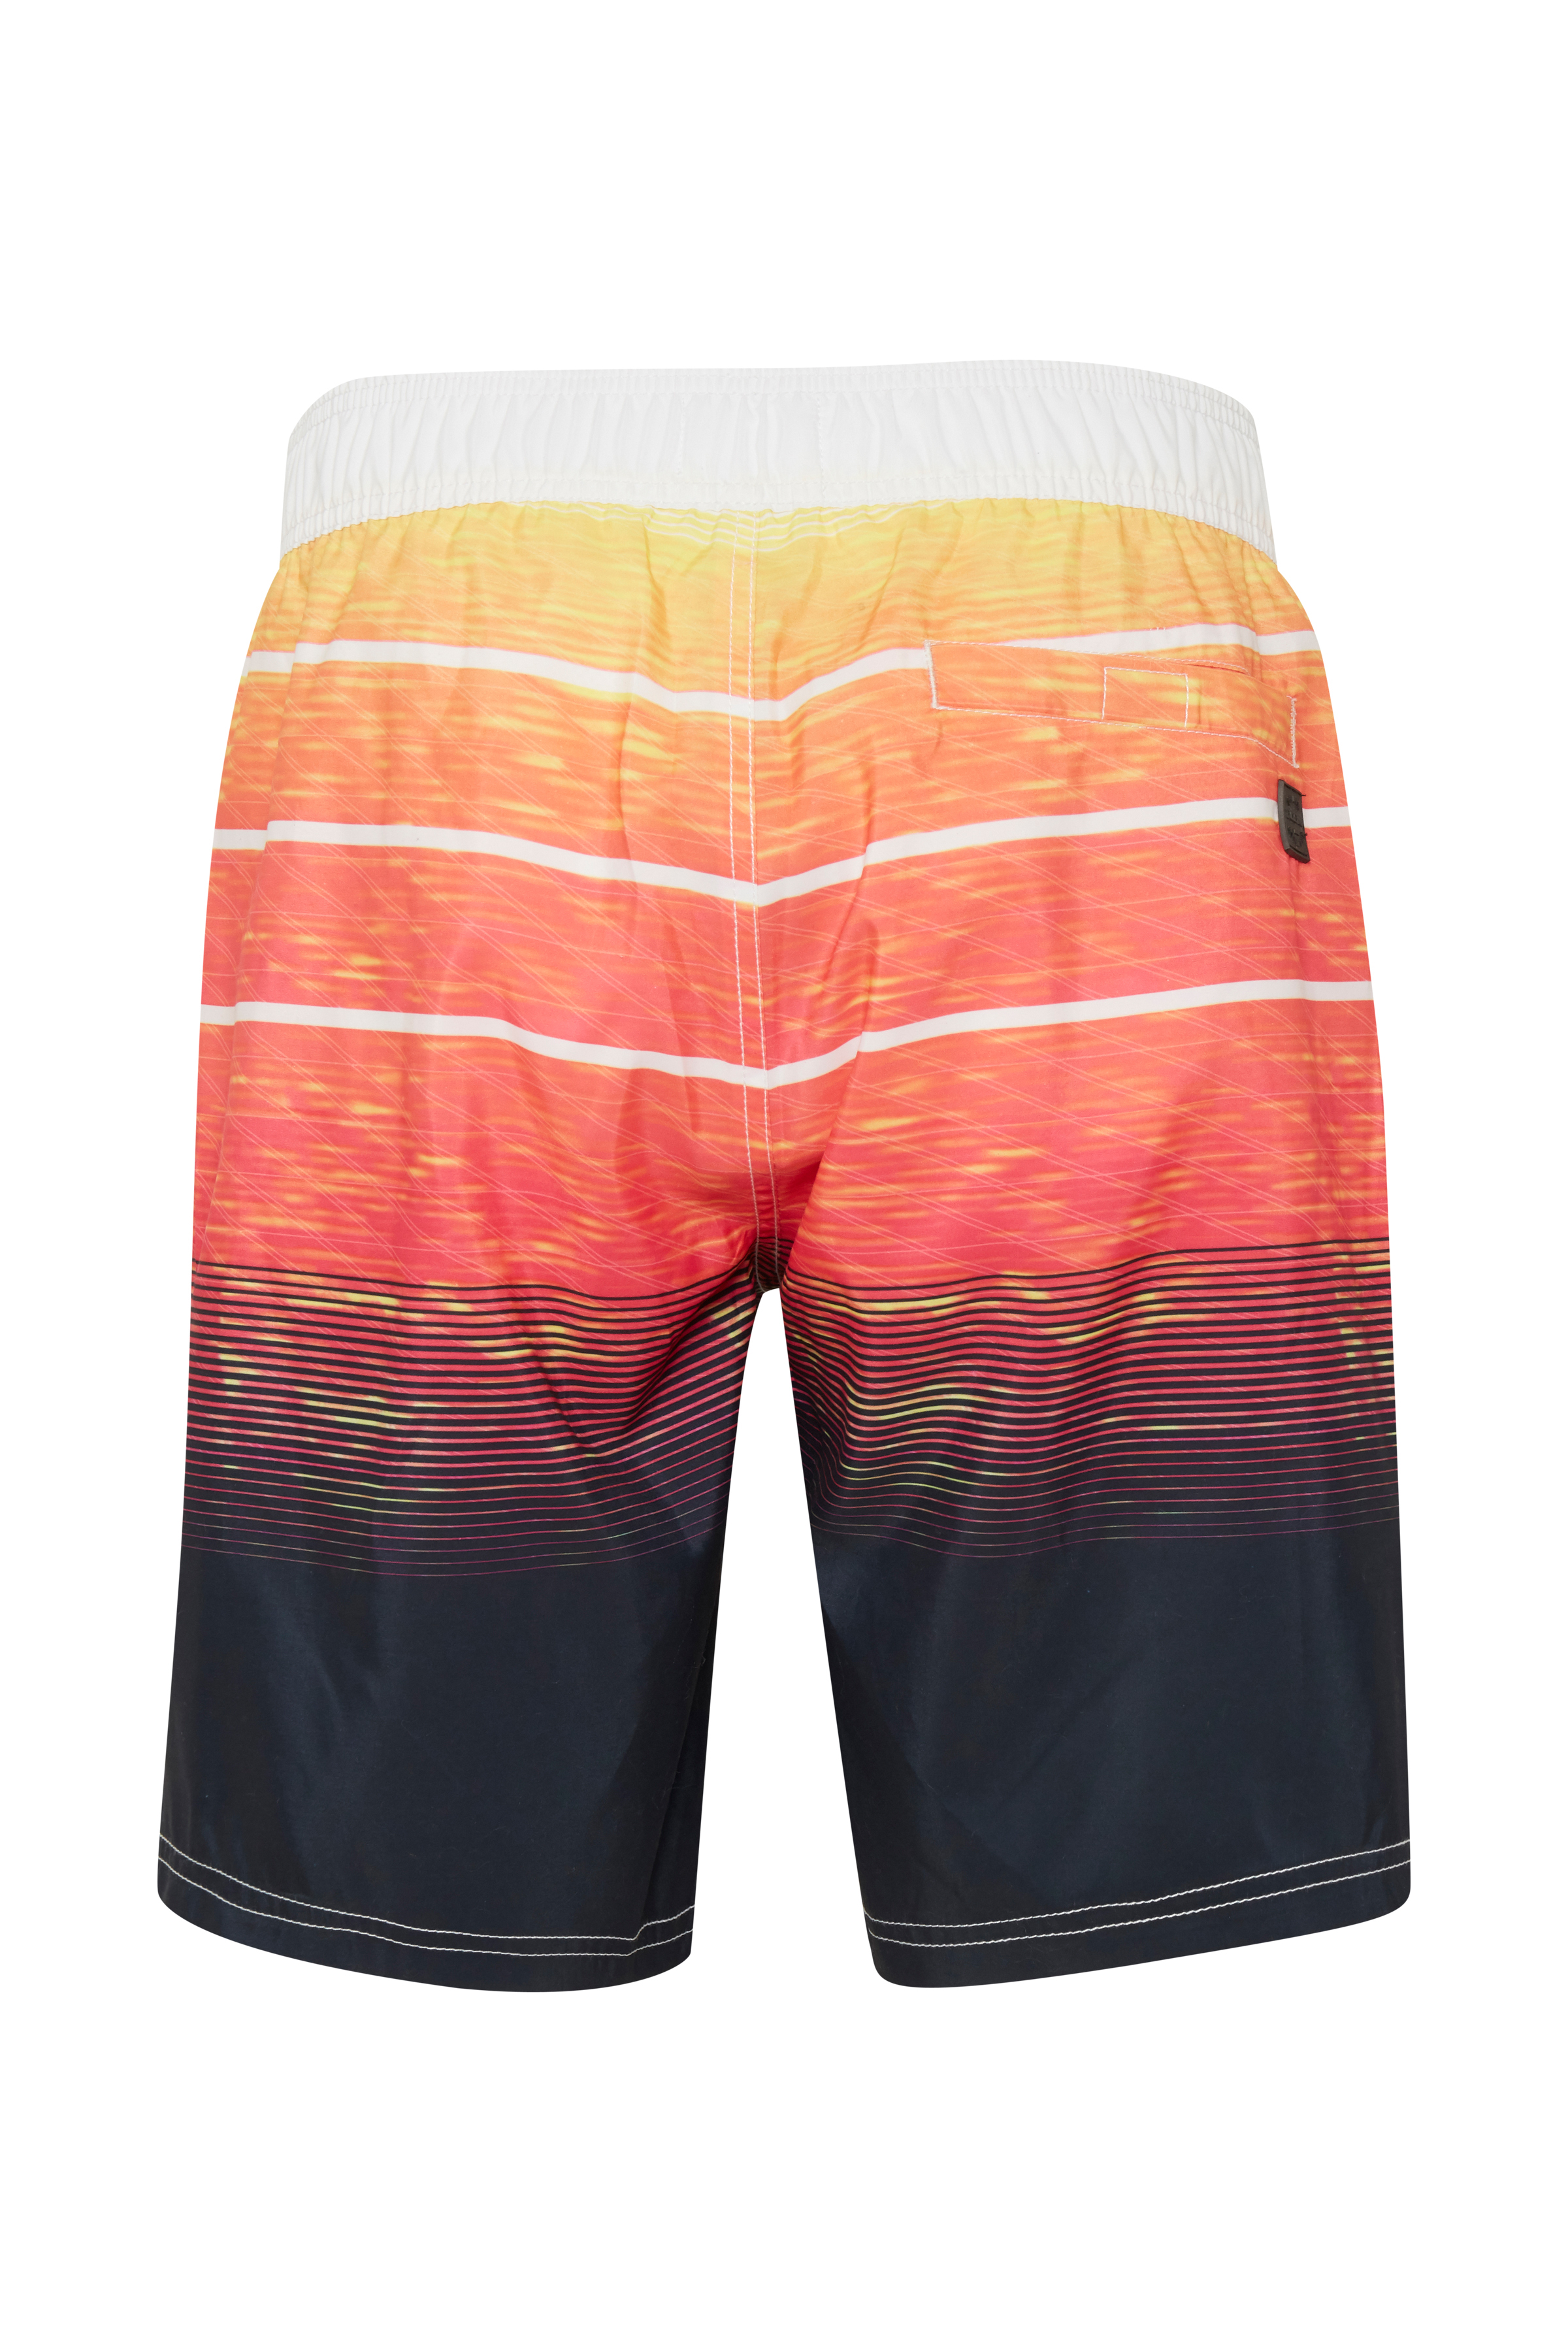 Sun Orange Badetøj – Køb Sun Orange Badetøj fra str. S-XXL her